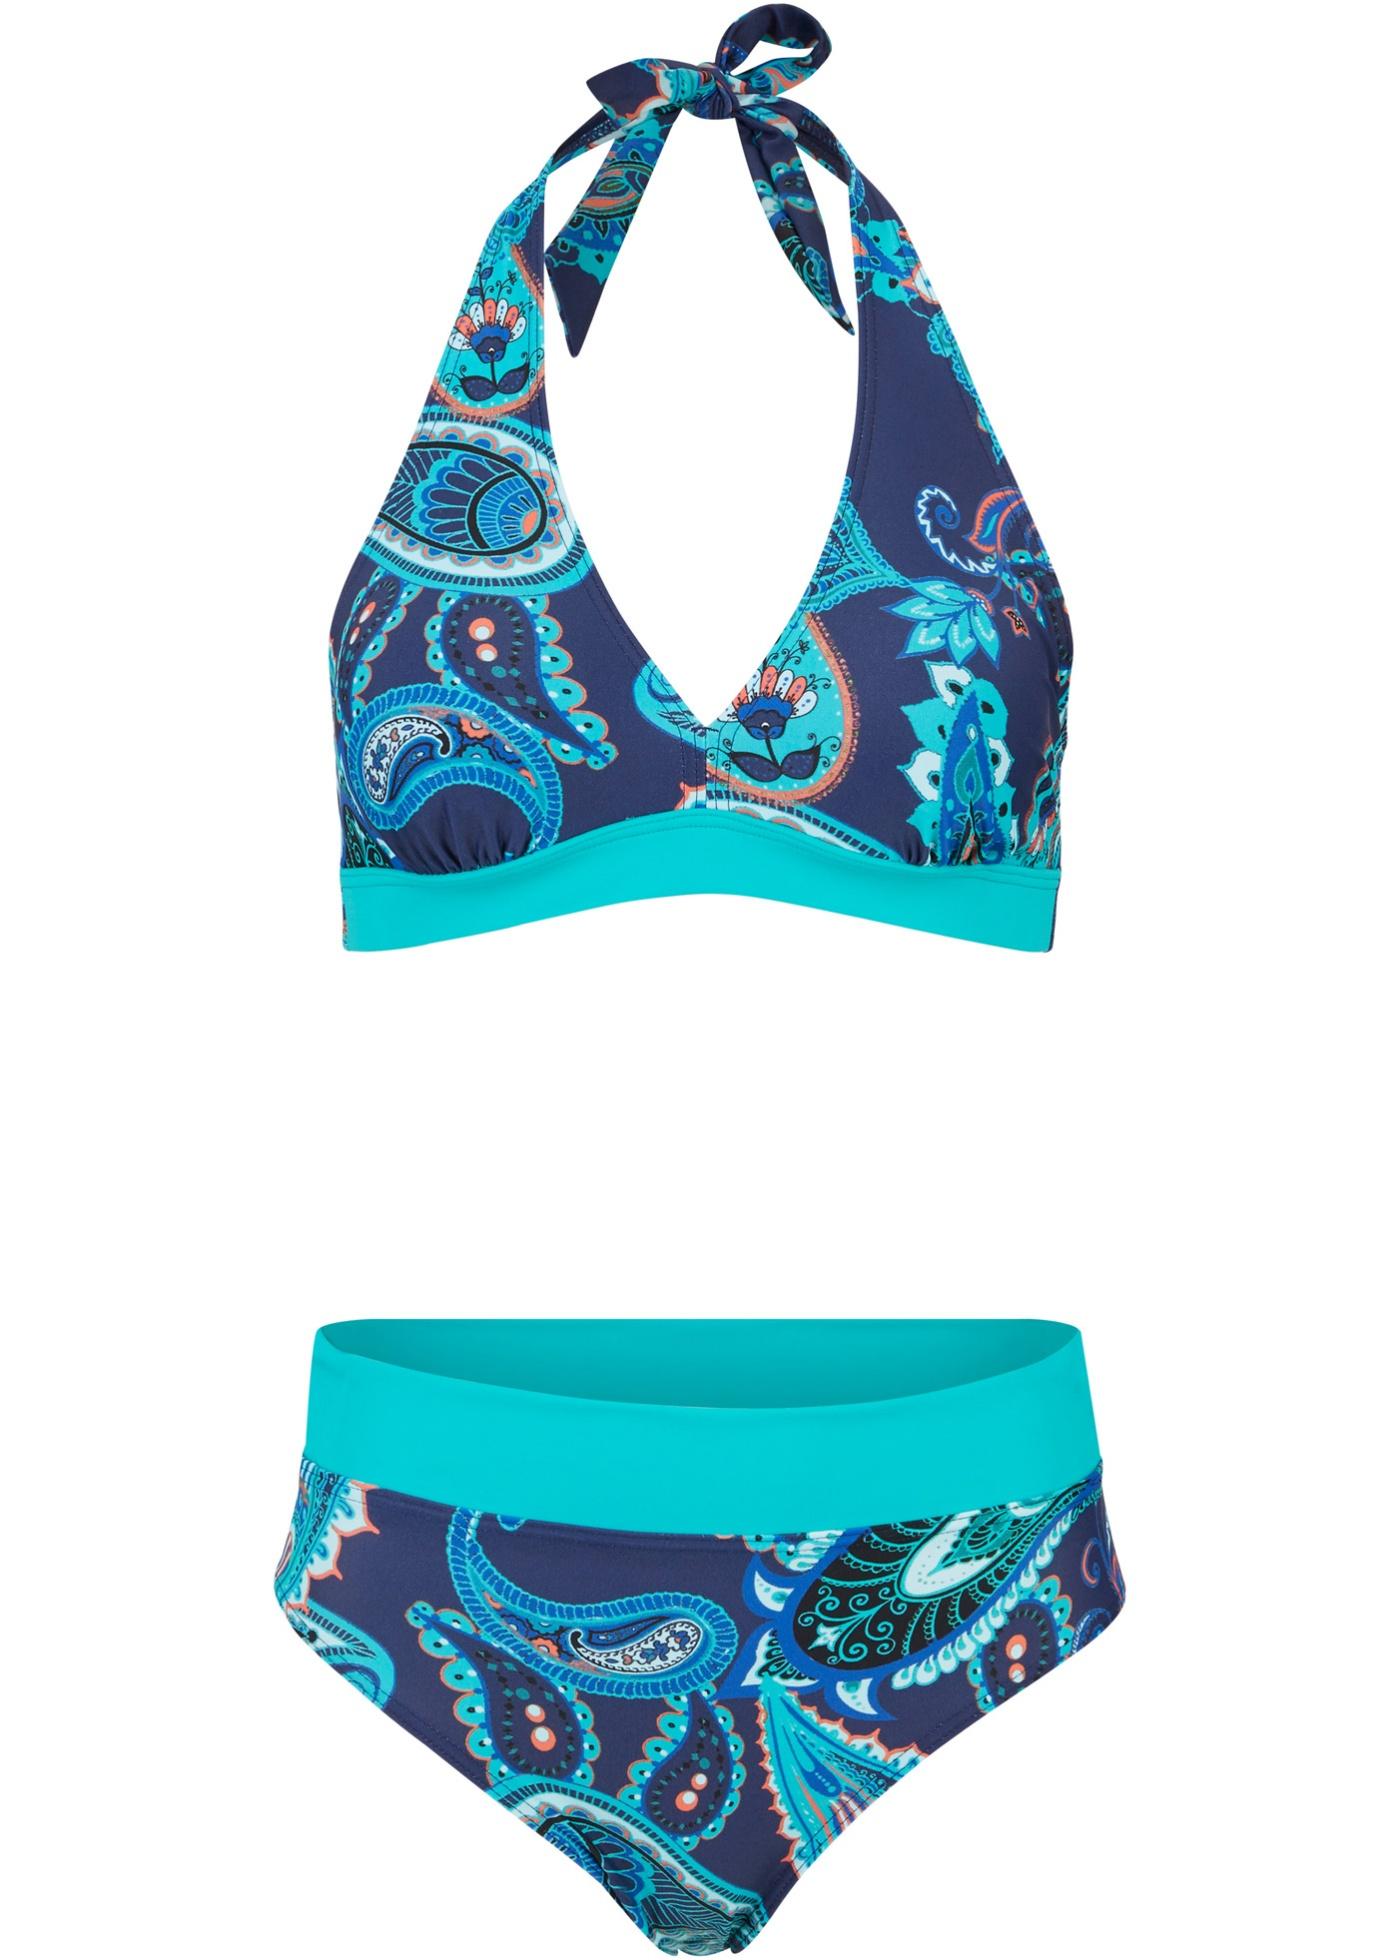 Bikini dos nu (Ens. 2 pces.) durable